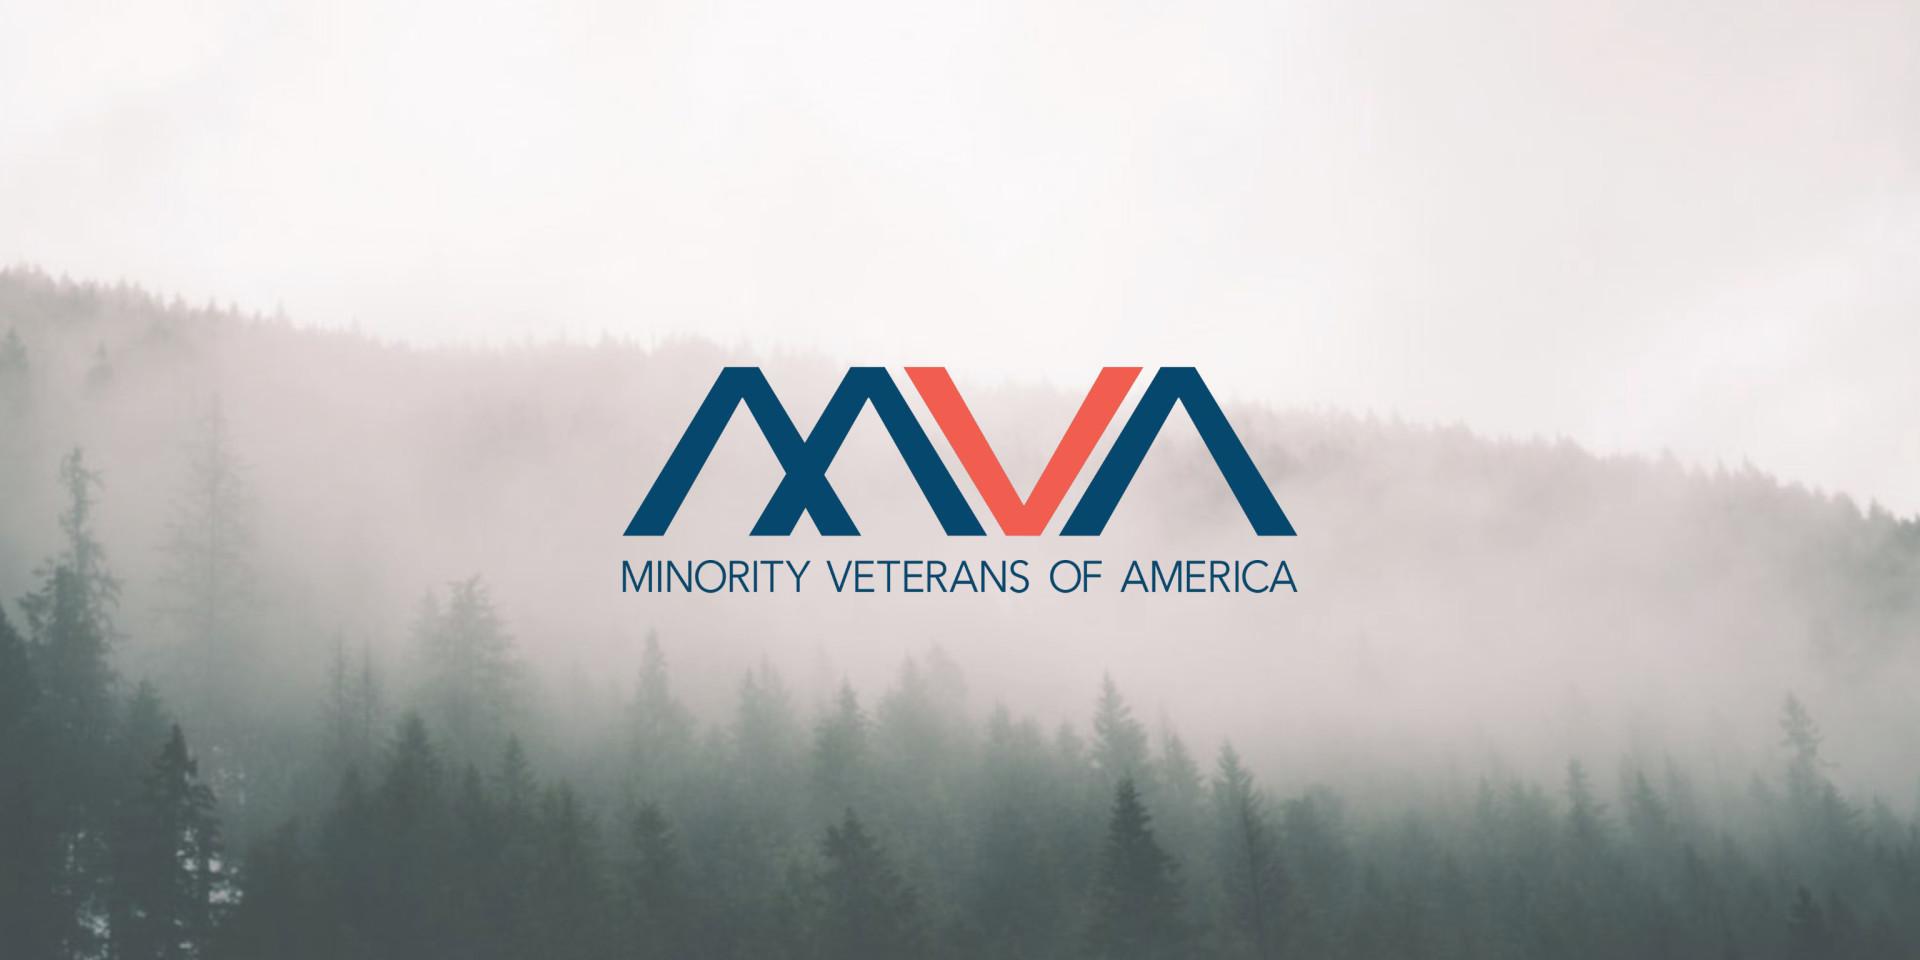 Minority Veterans of America